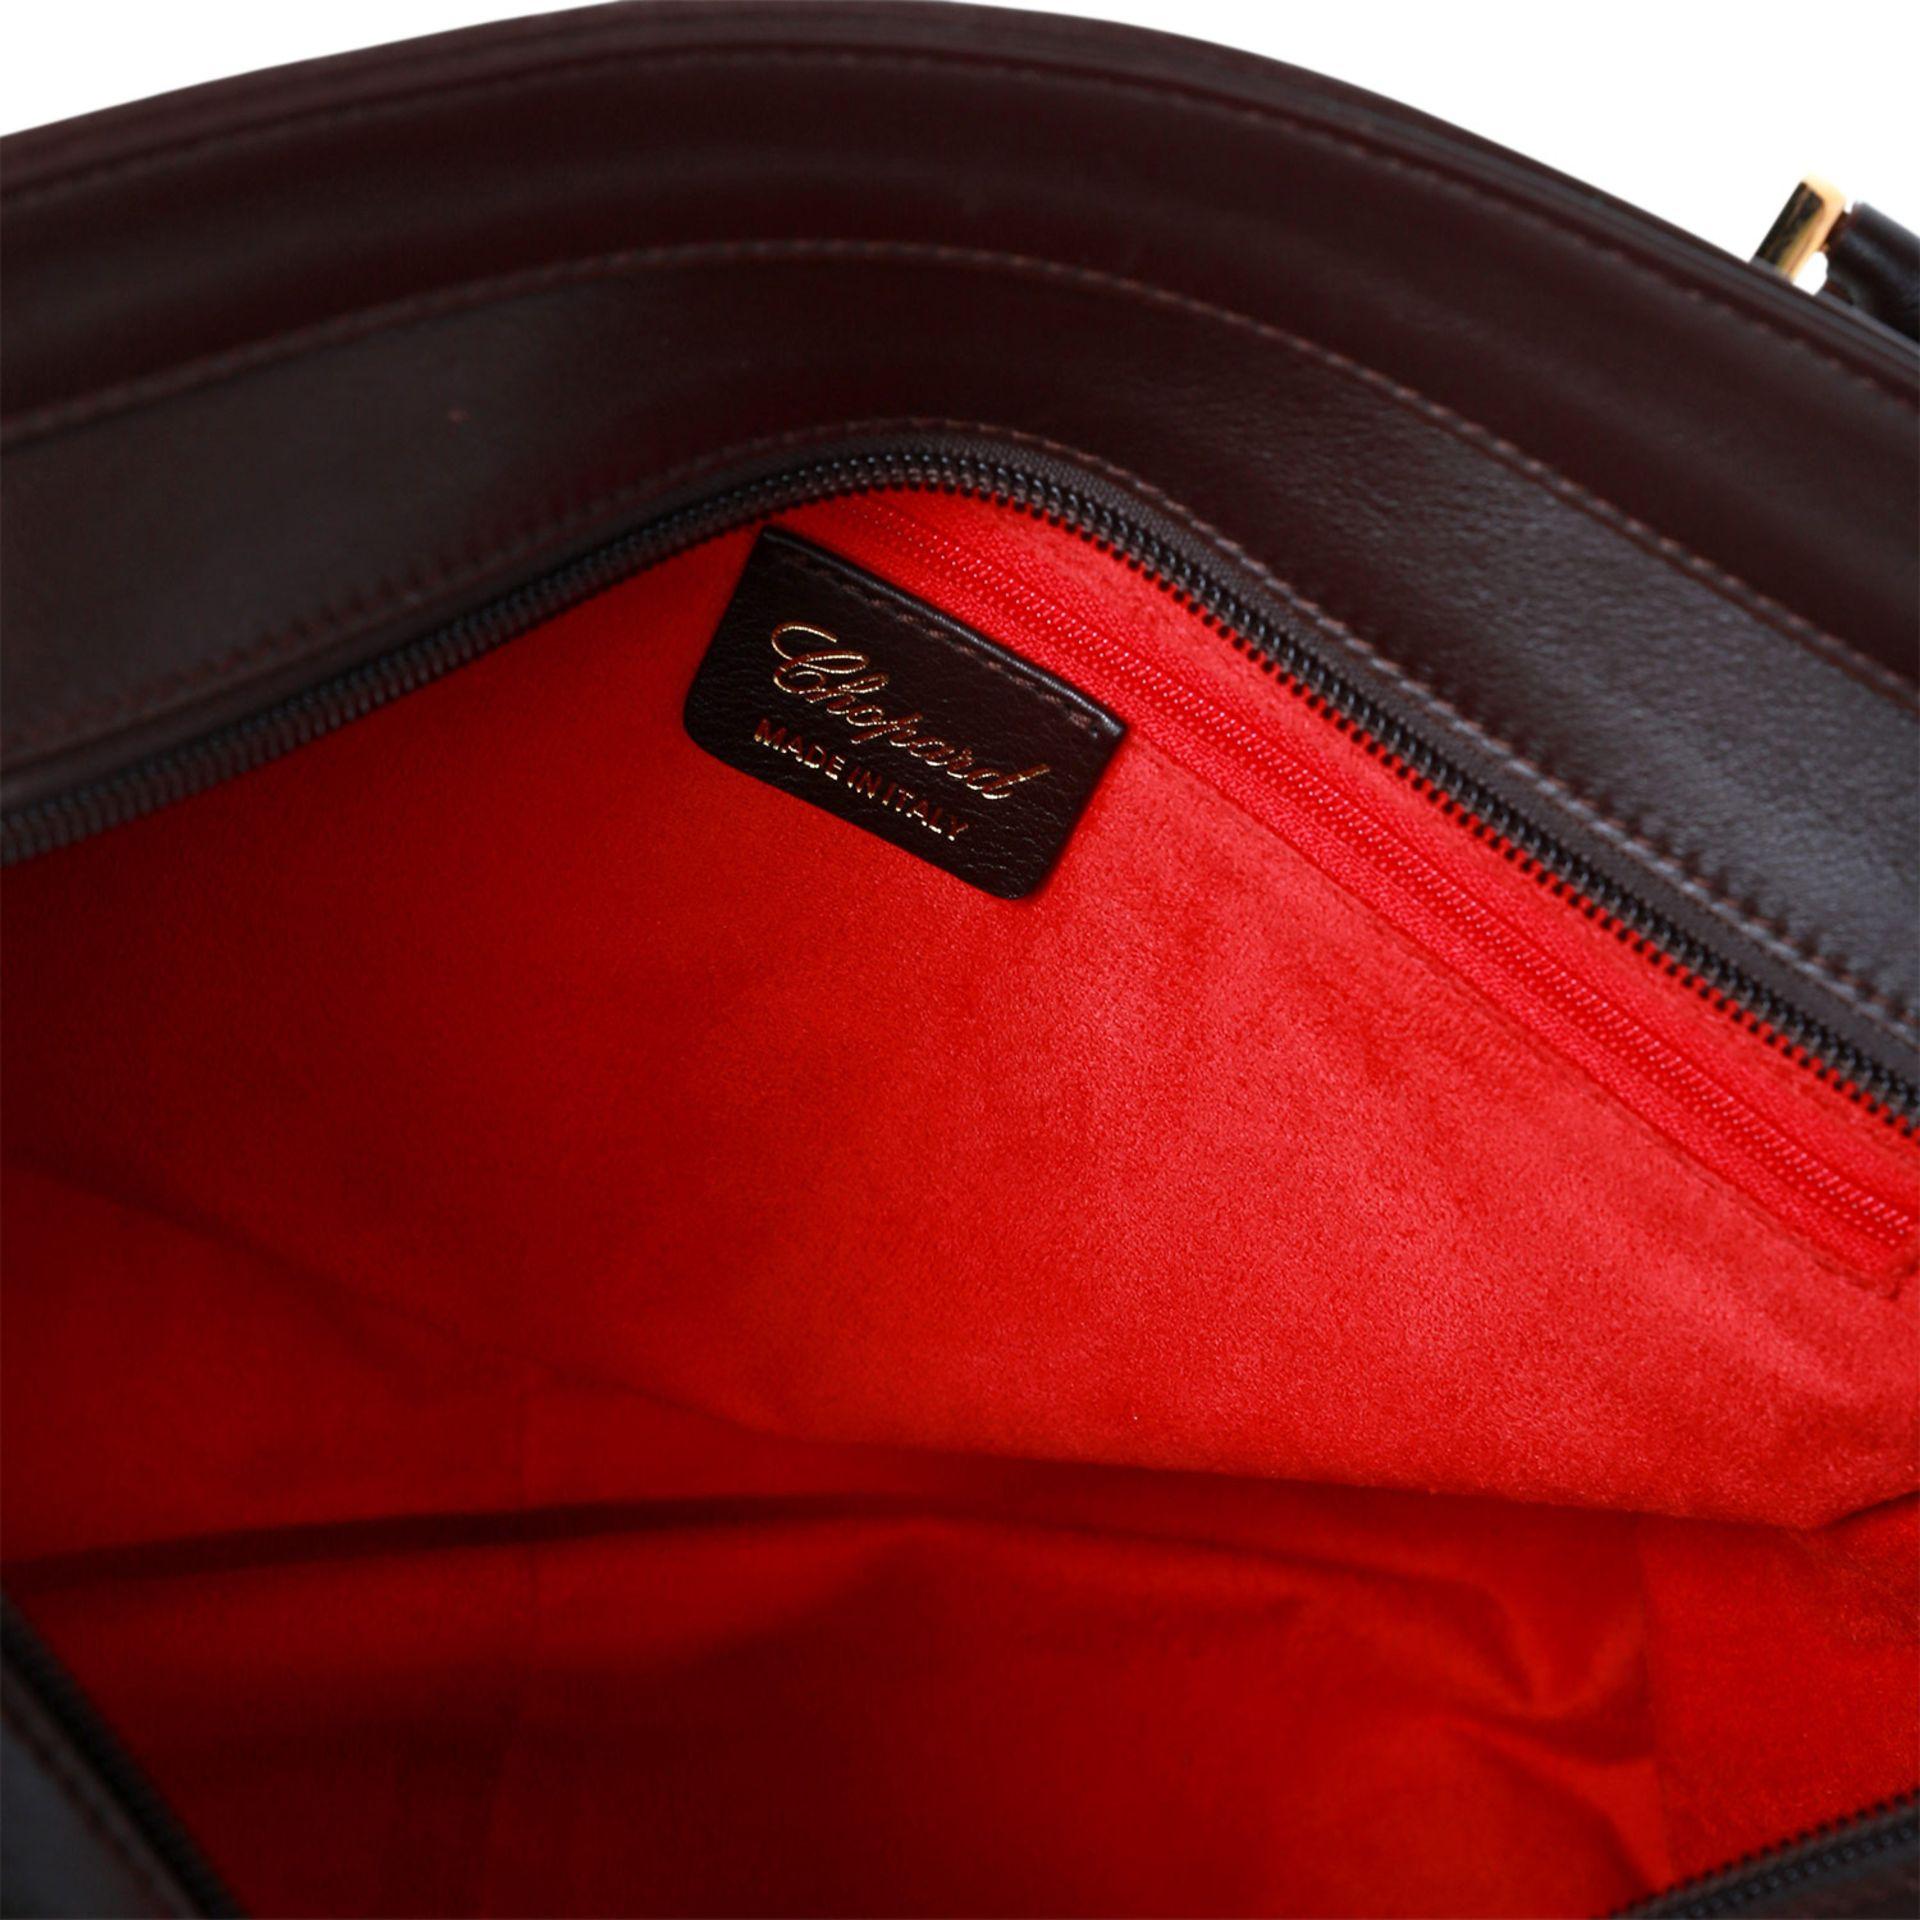 CHOPARD GENÈVE Henkeltasche. Bowlingbagform aus perlweißem Textil, bordeauxfarbene Lederdetails - Bild 13 aus 14